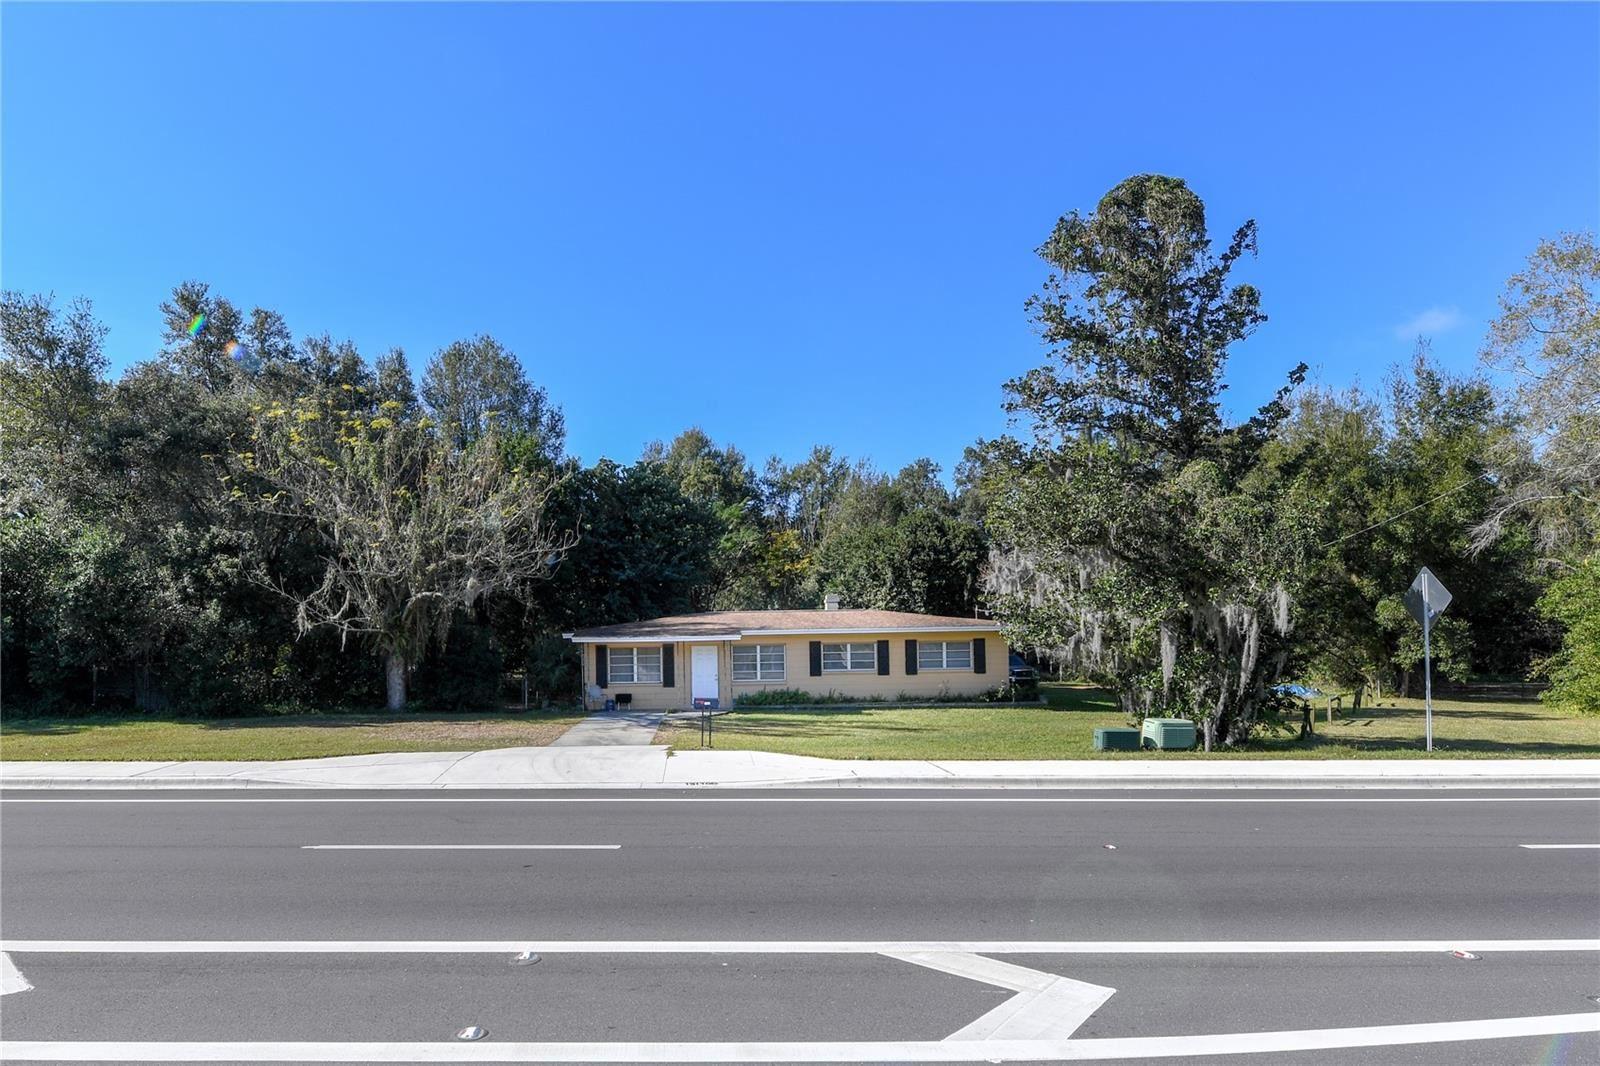 1106 LITHIA PINECREST ROAD, Brandon, FL 33511 - MLS#: T3316073